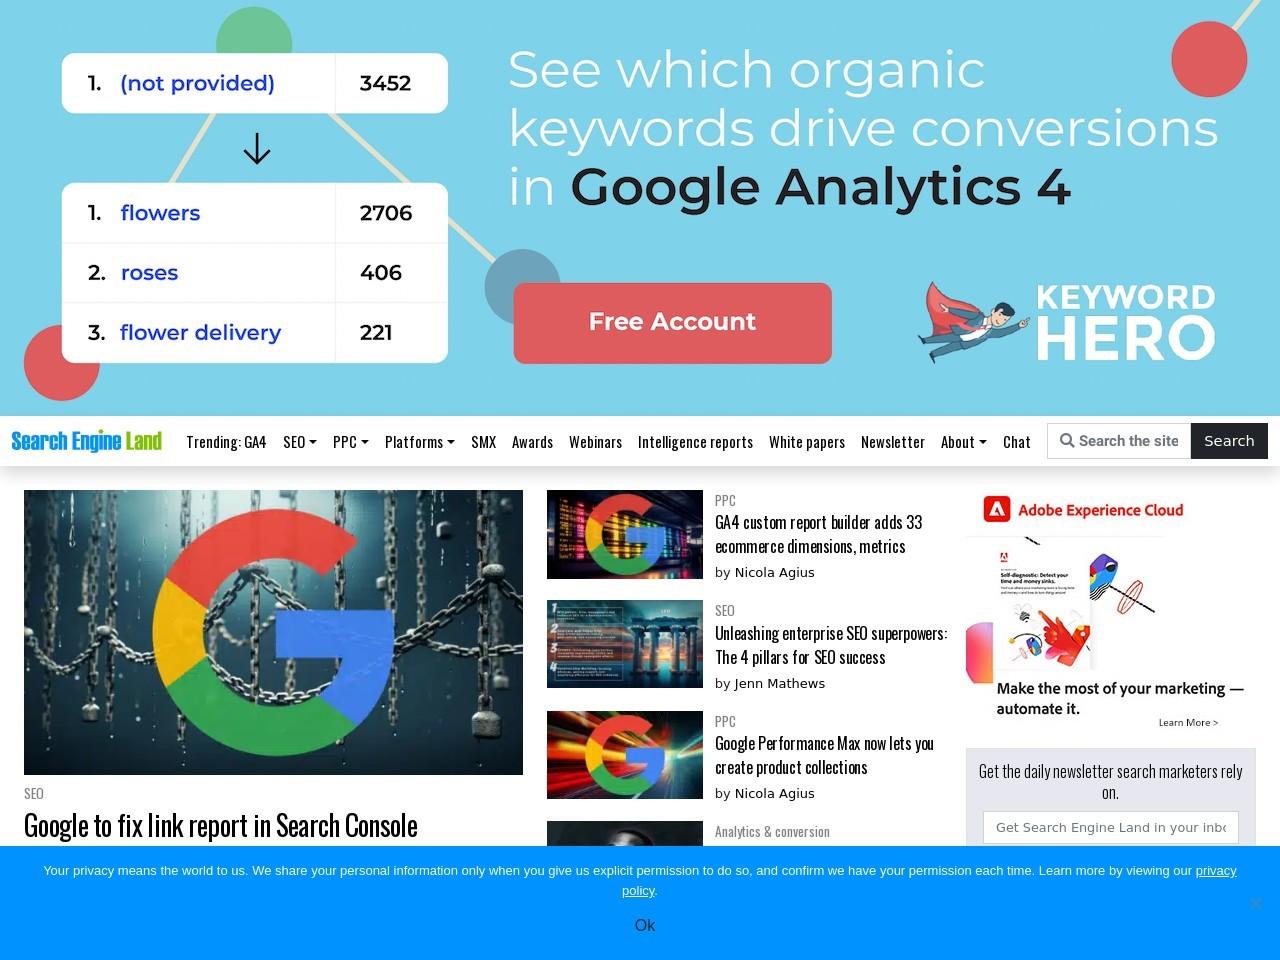 searchengineland.com